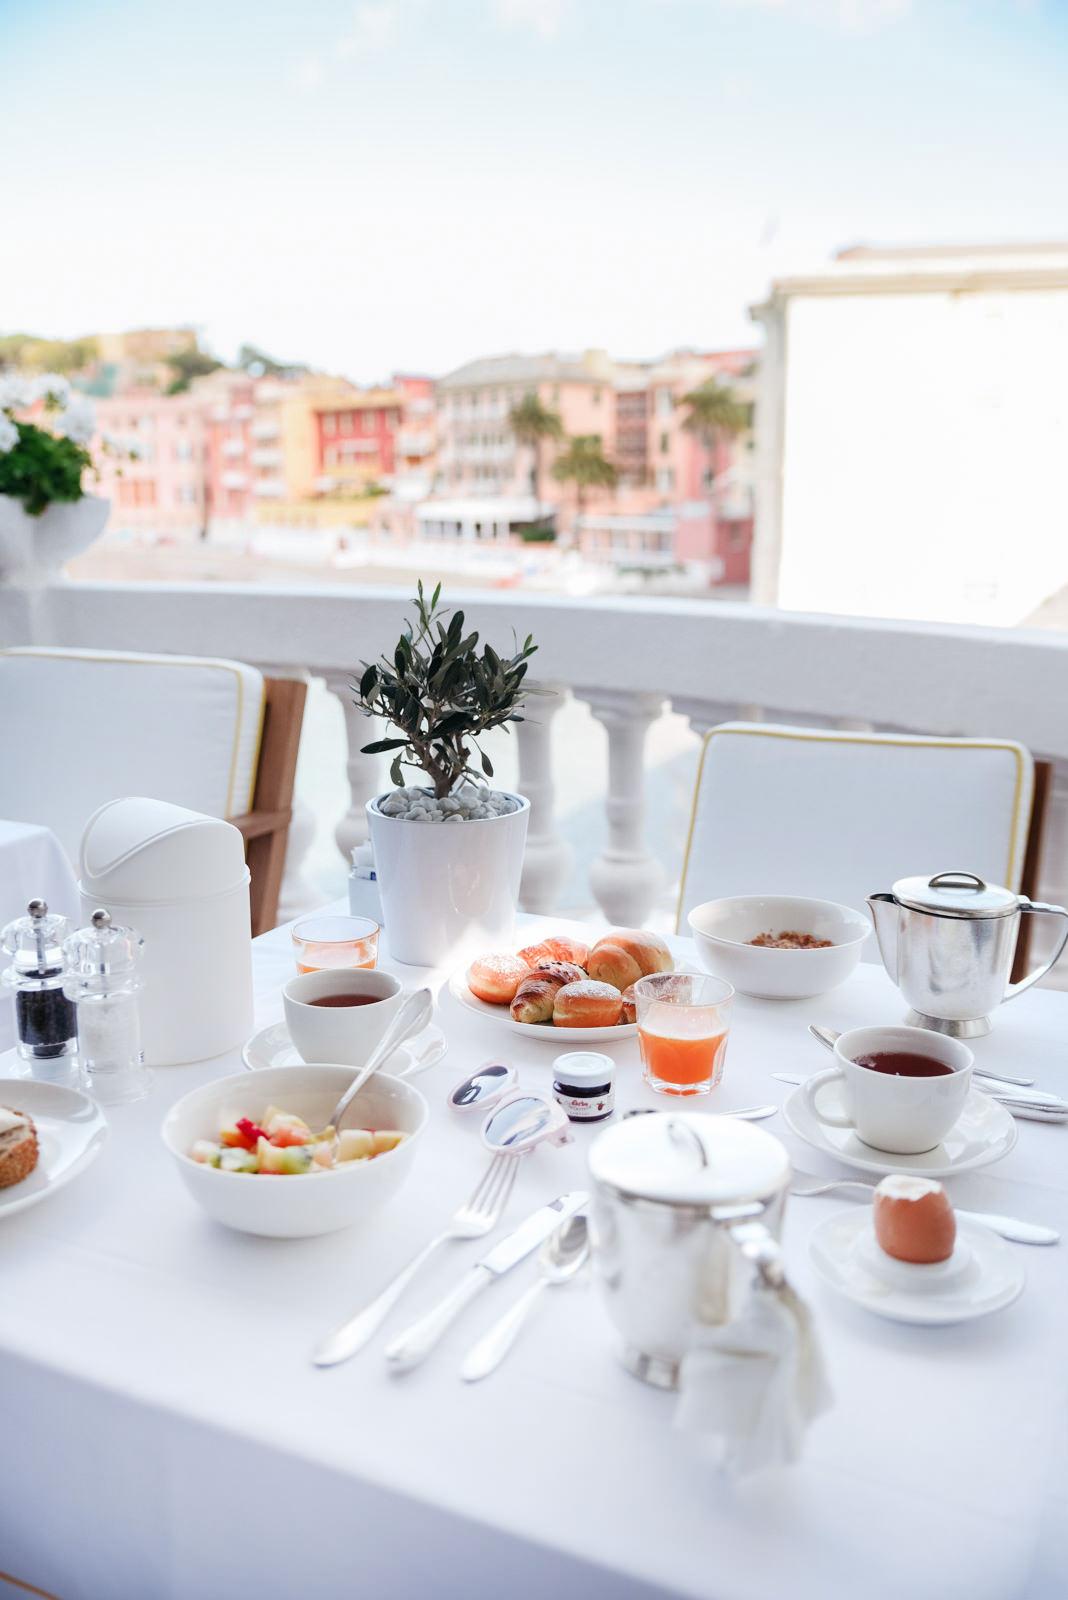 Blog-Mode-And-The-City-Lifestyle-Italie-Sestri-Levante-Cinque-Terre